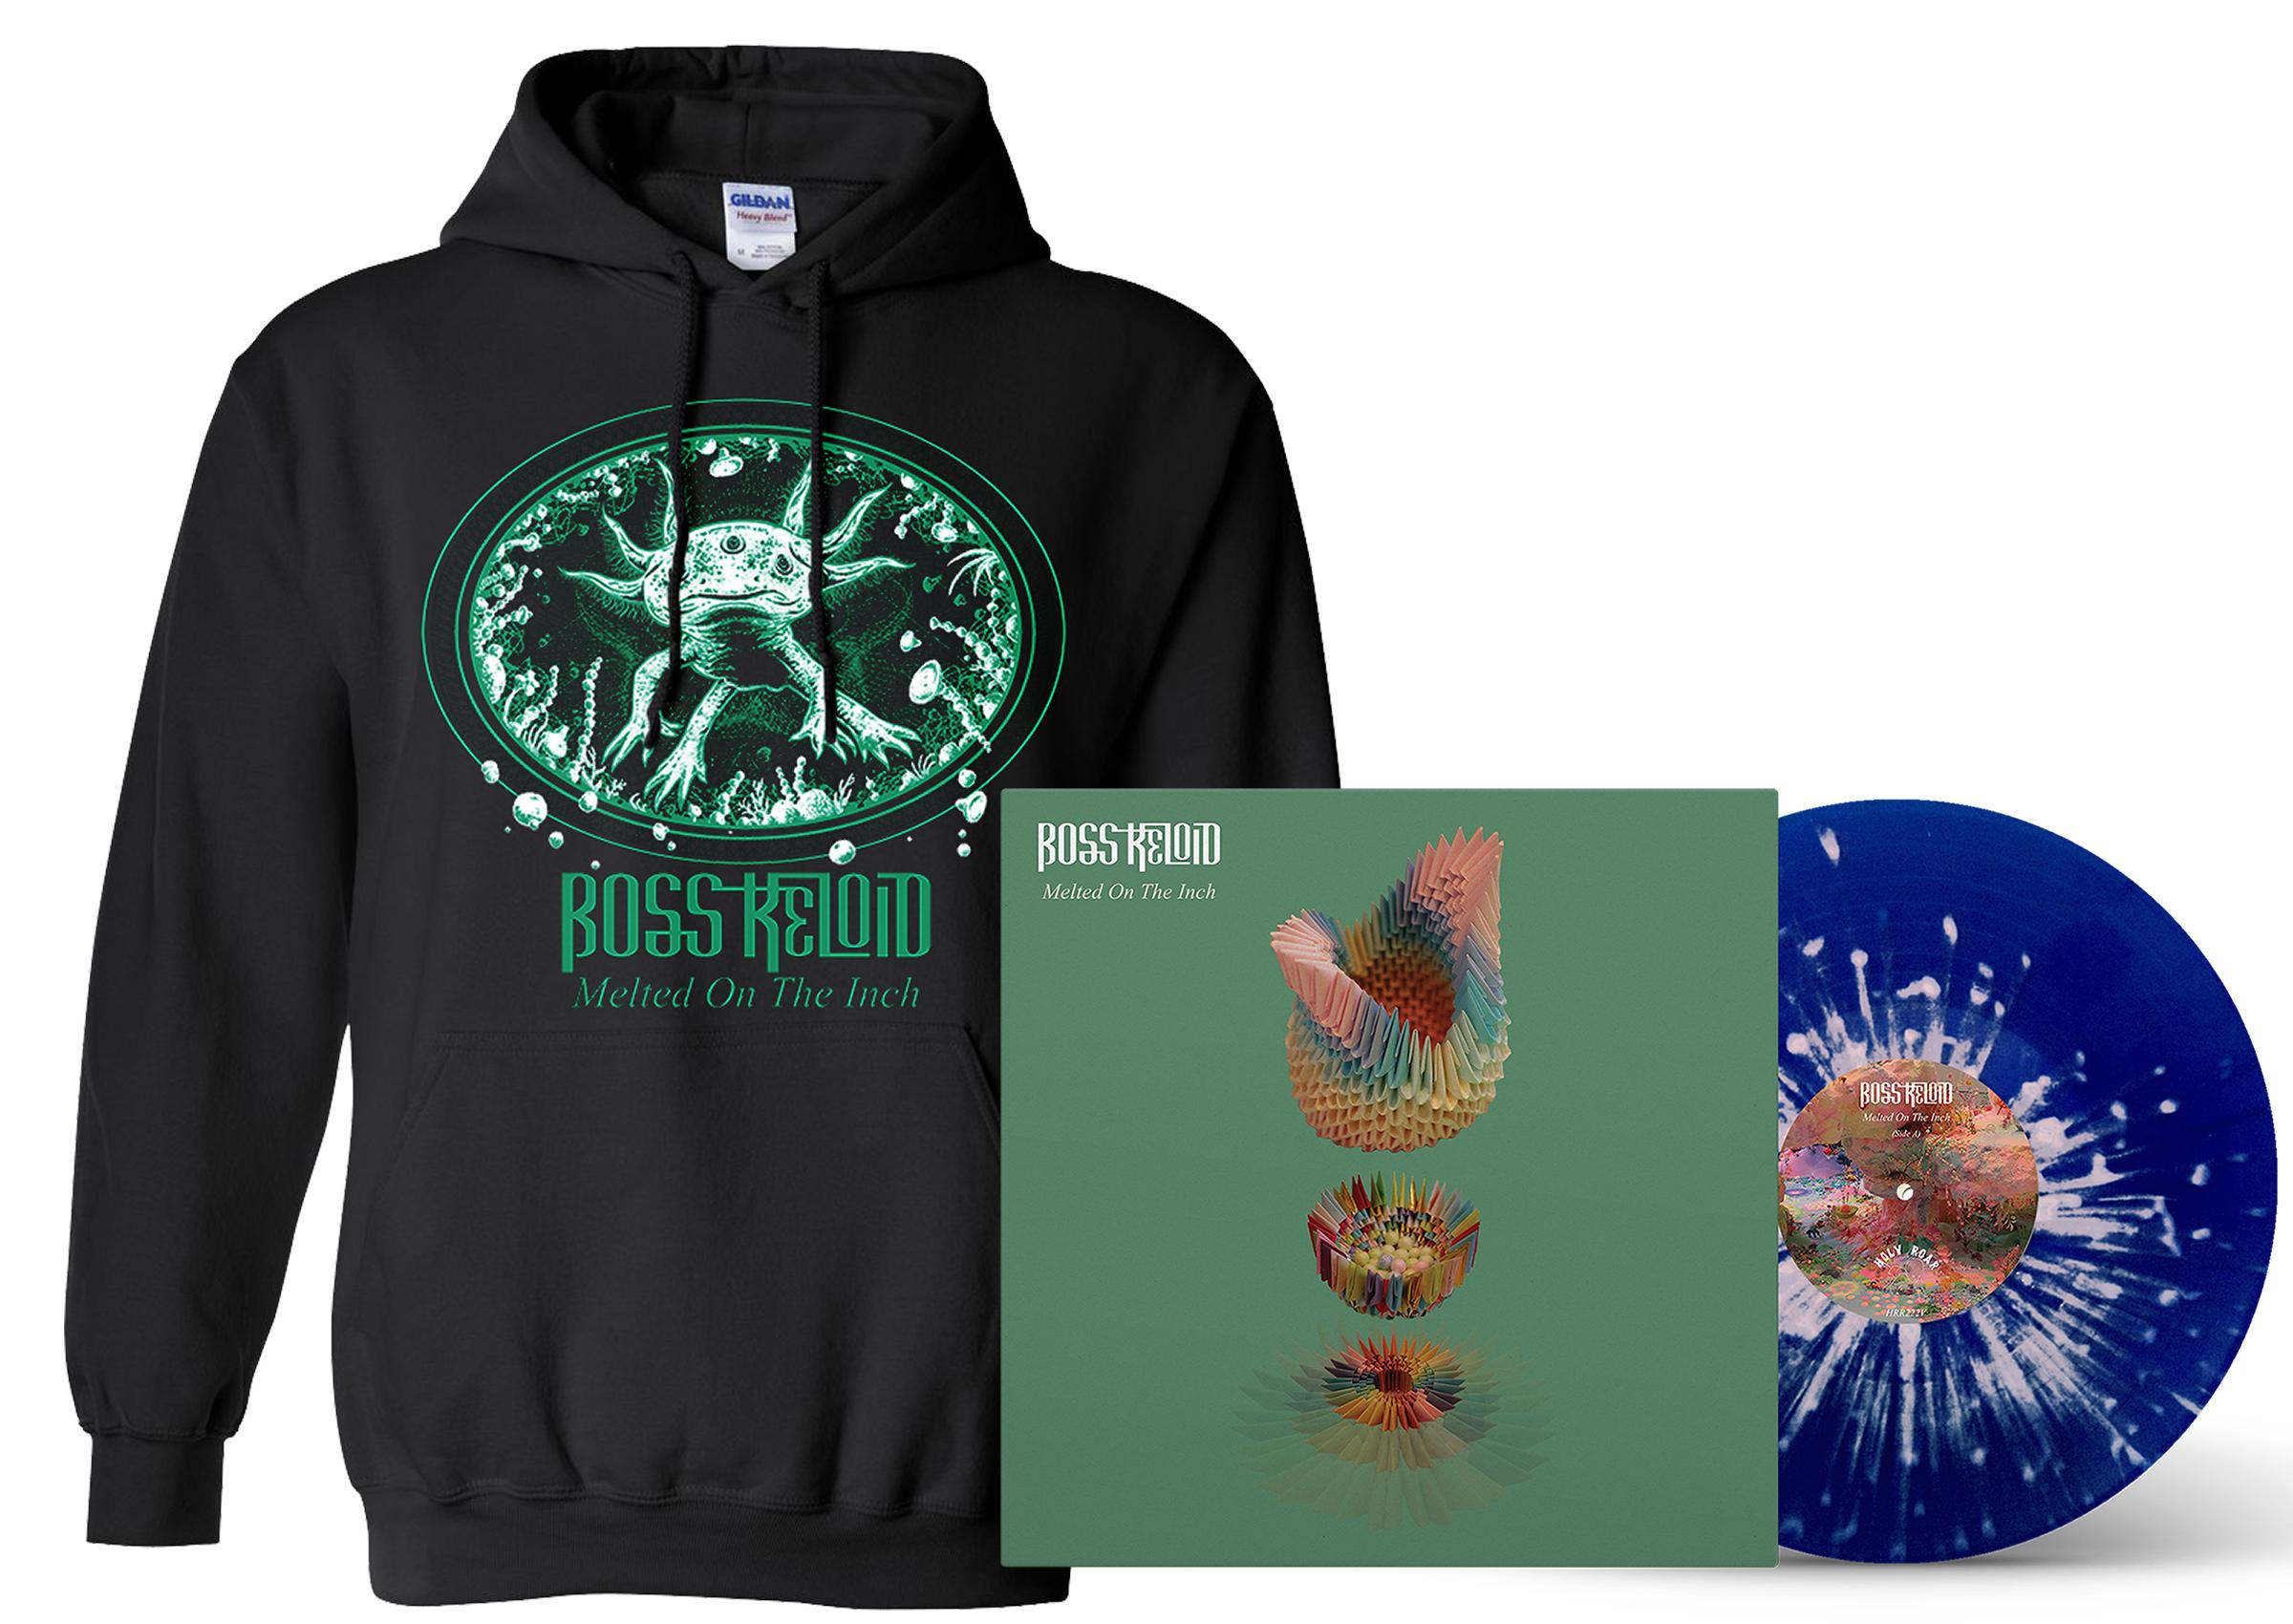 Boss Keloid 'Melted...' Axolotl hoodie + LP